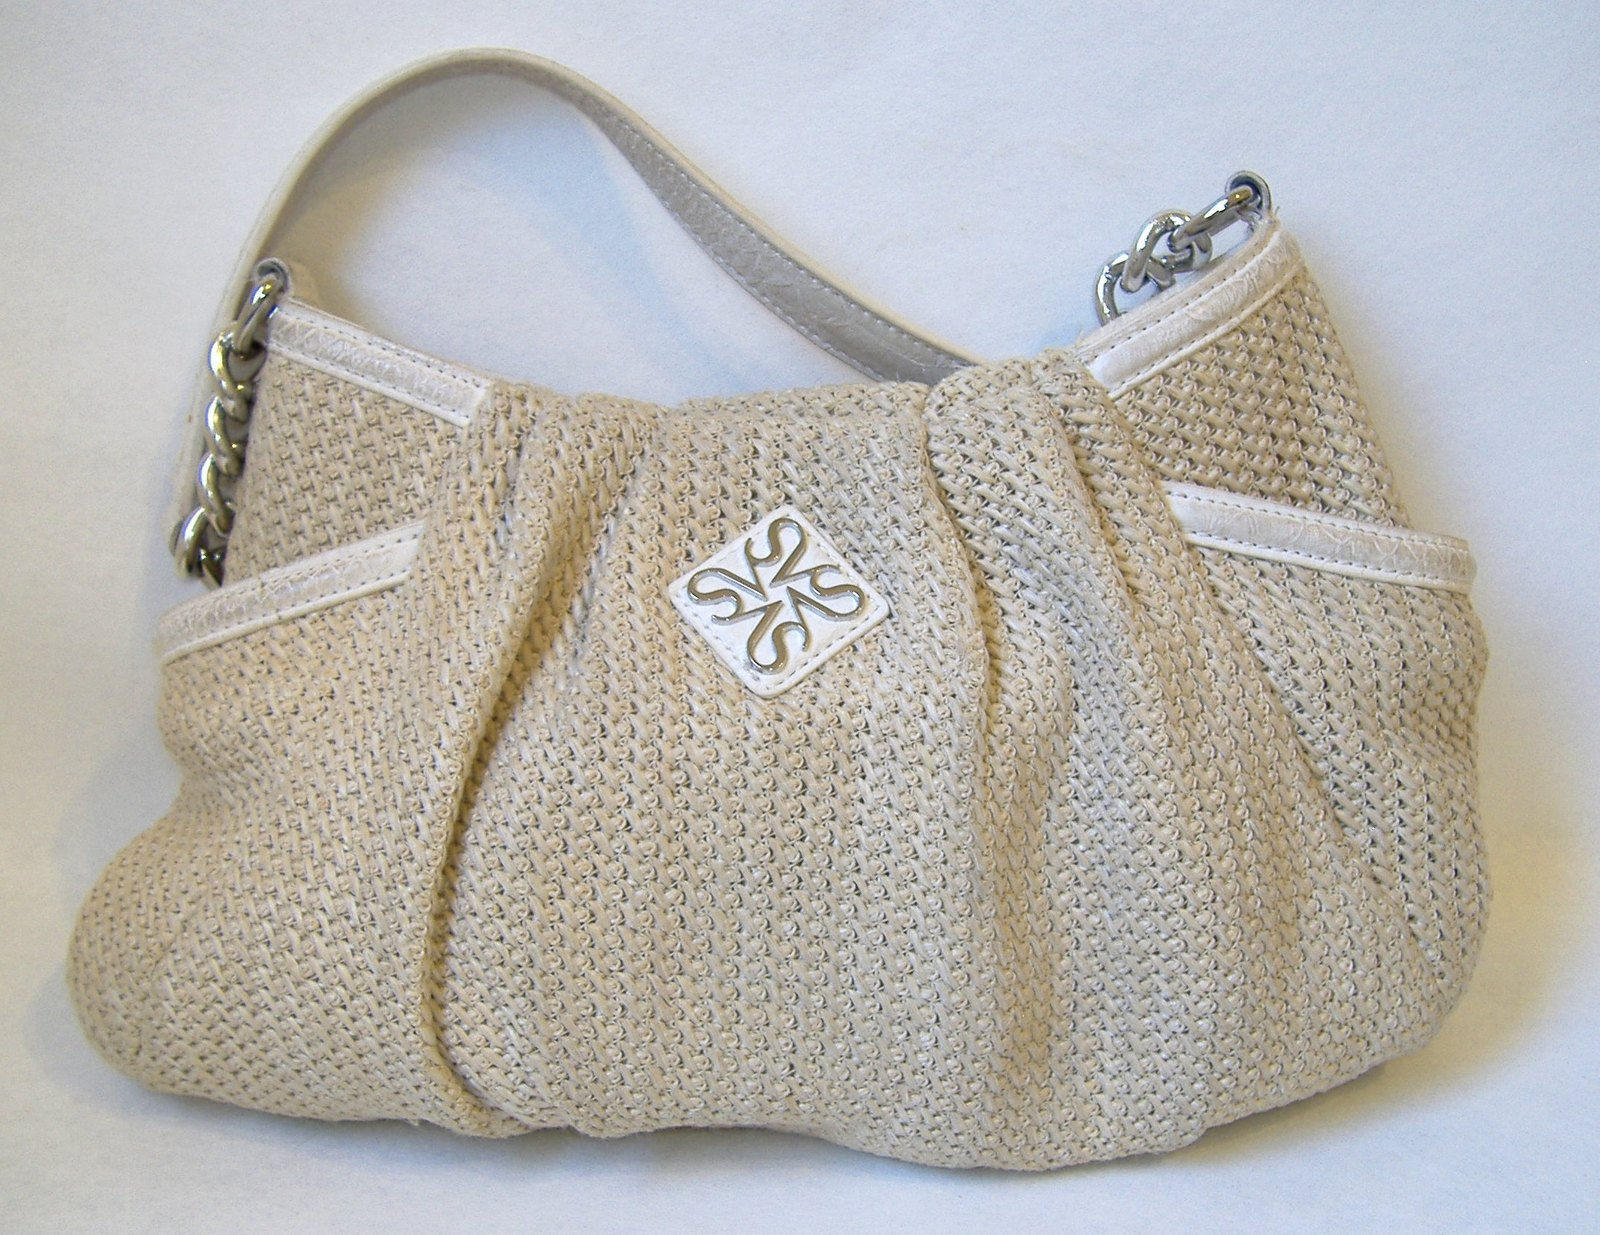 Simply Vera Hobo Purse Beige Off White Knit Shoulder Bag Handbag Tote Lined 20 00